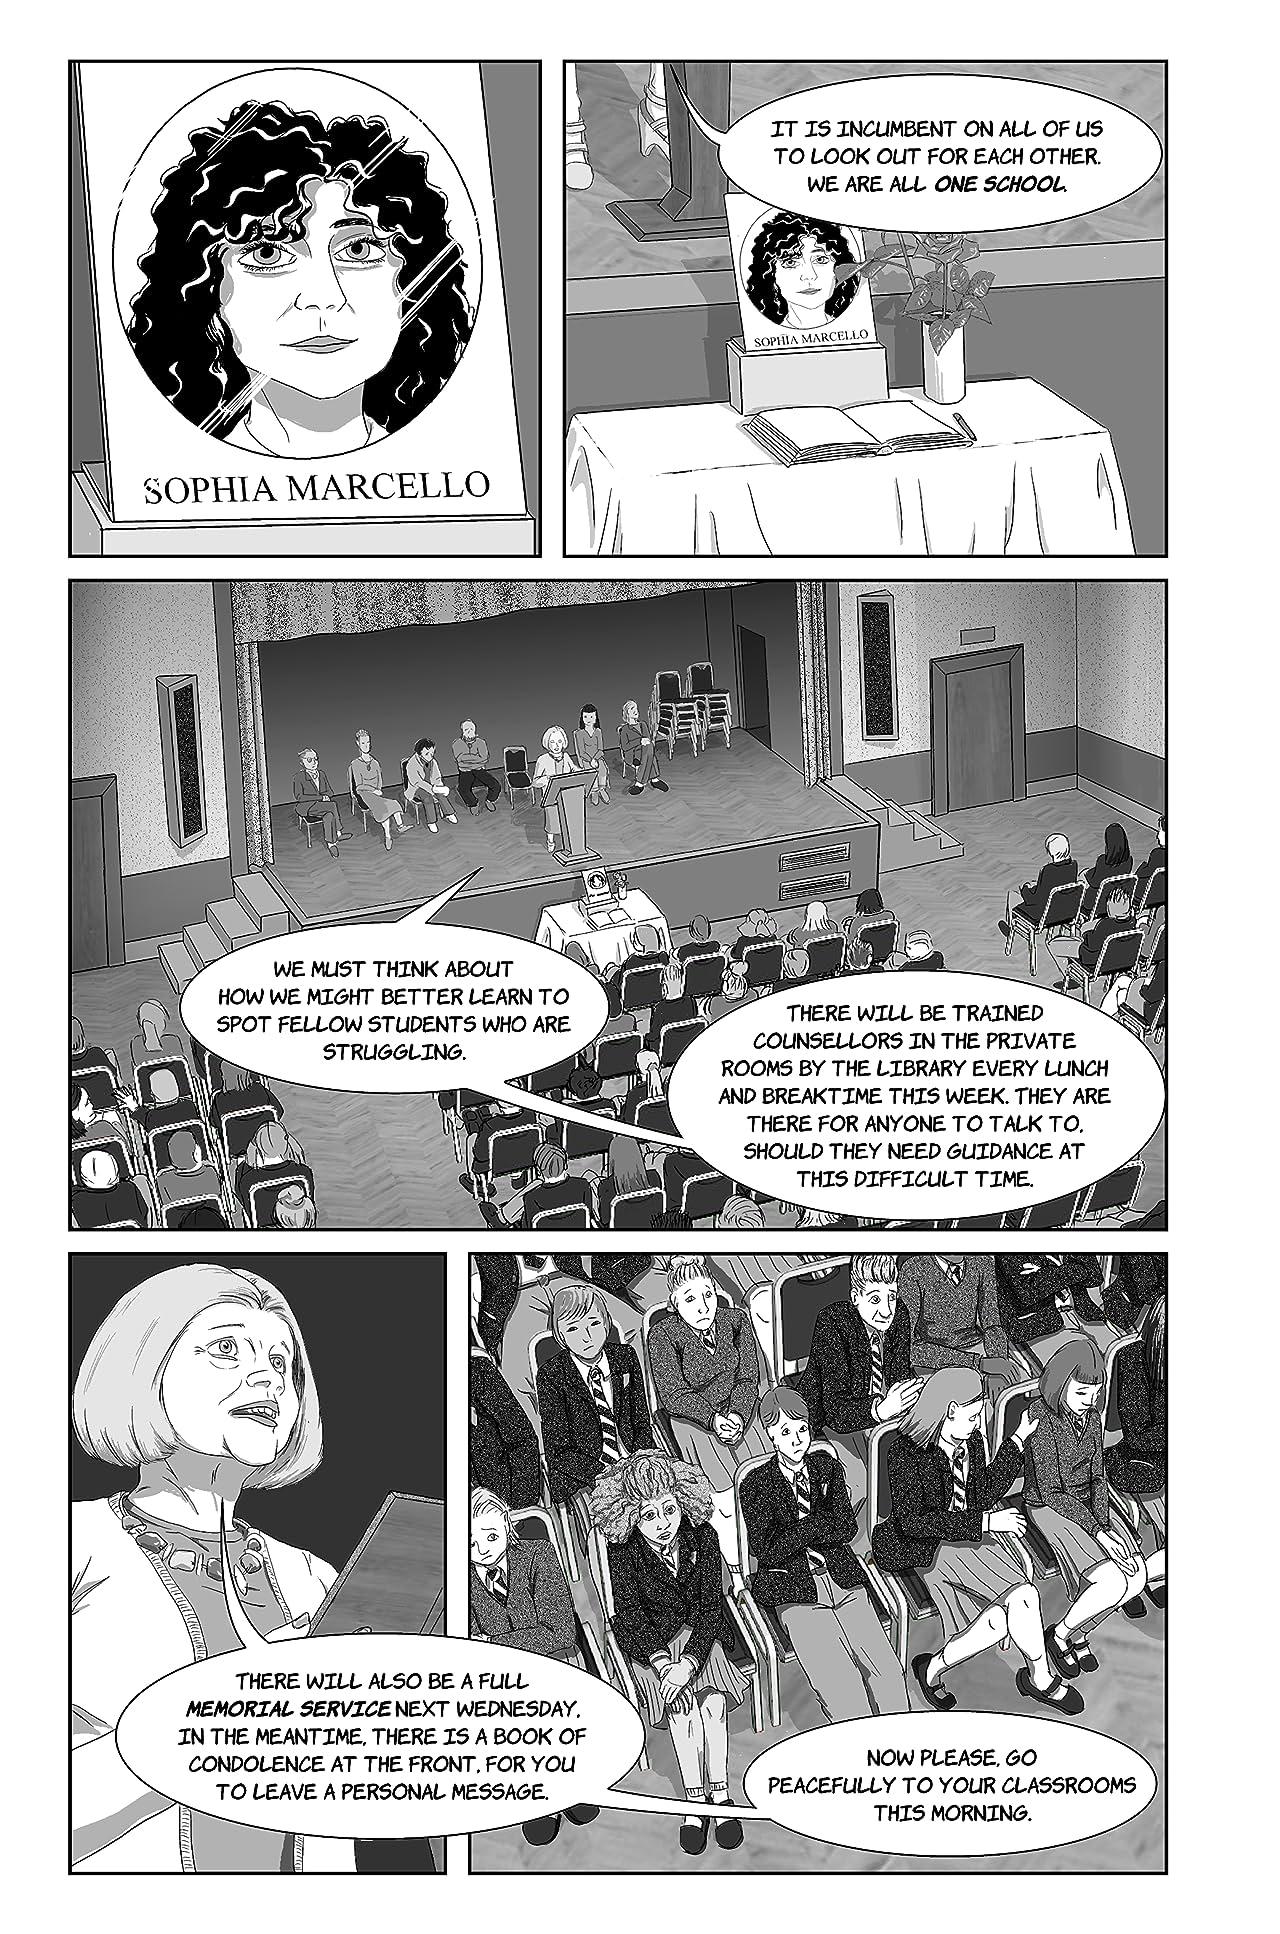 The Murder Club: Useless Deaths - Part 1